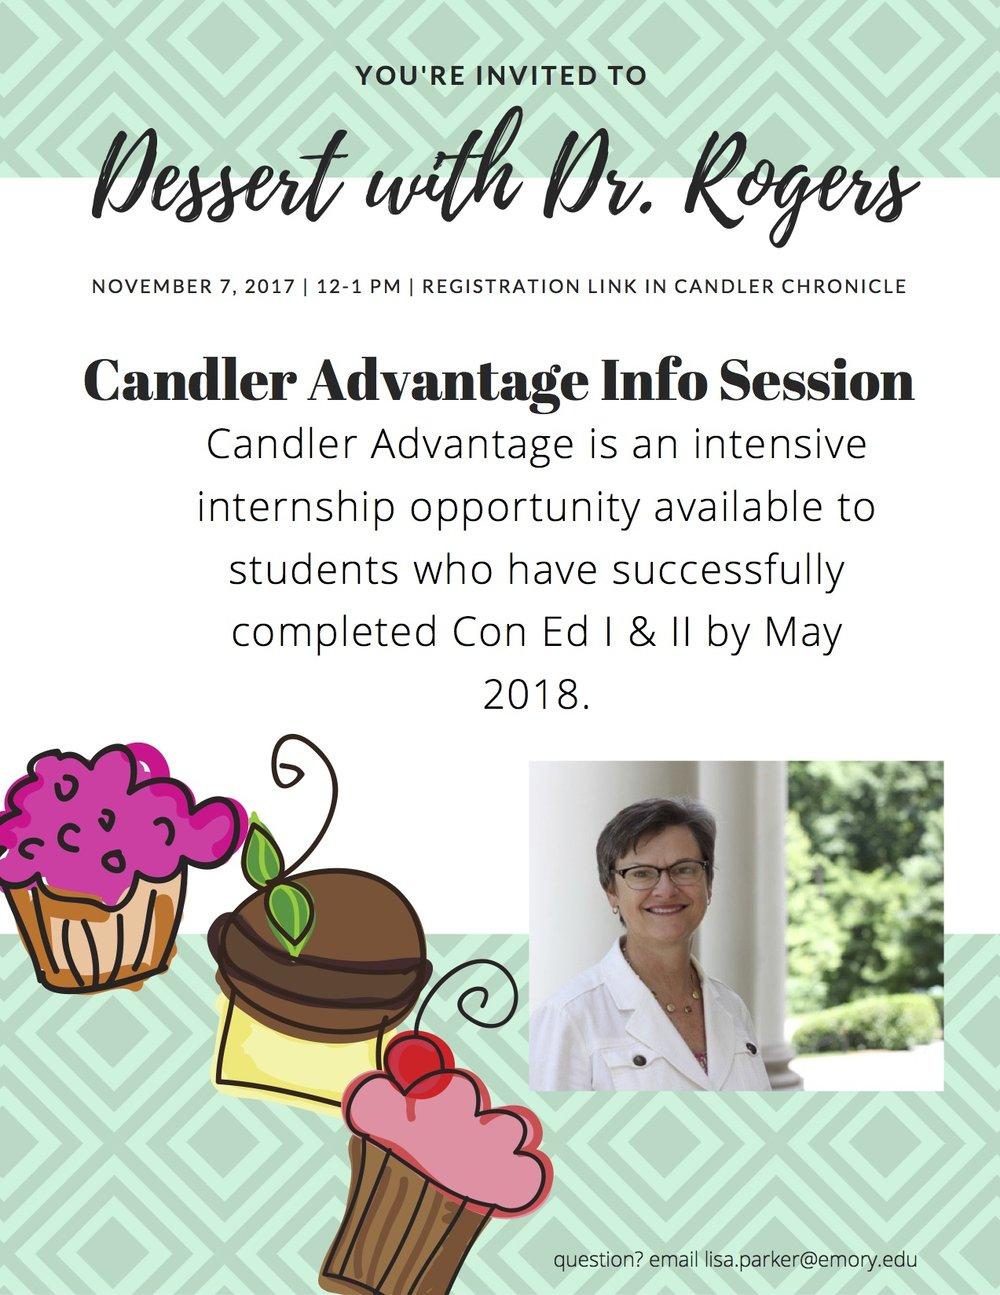 Dessert with Dr. Rogers.jpg